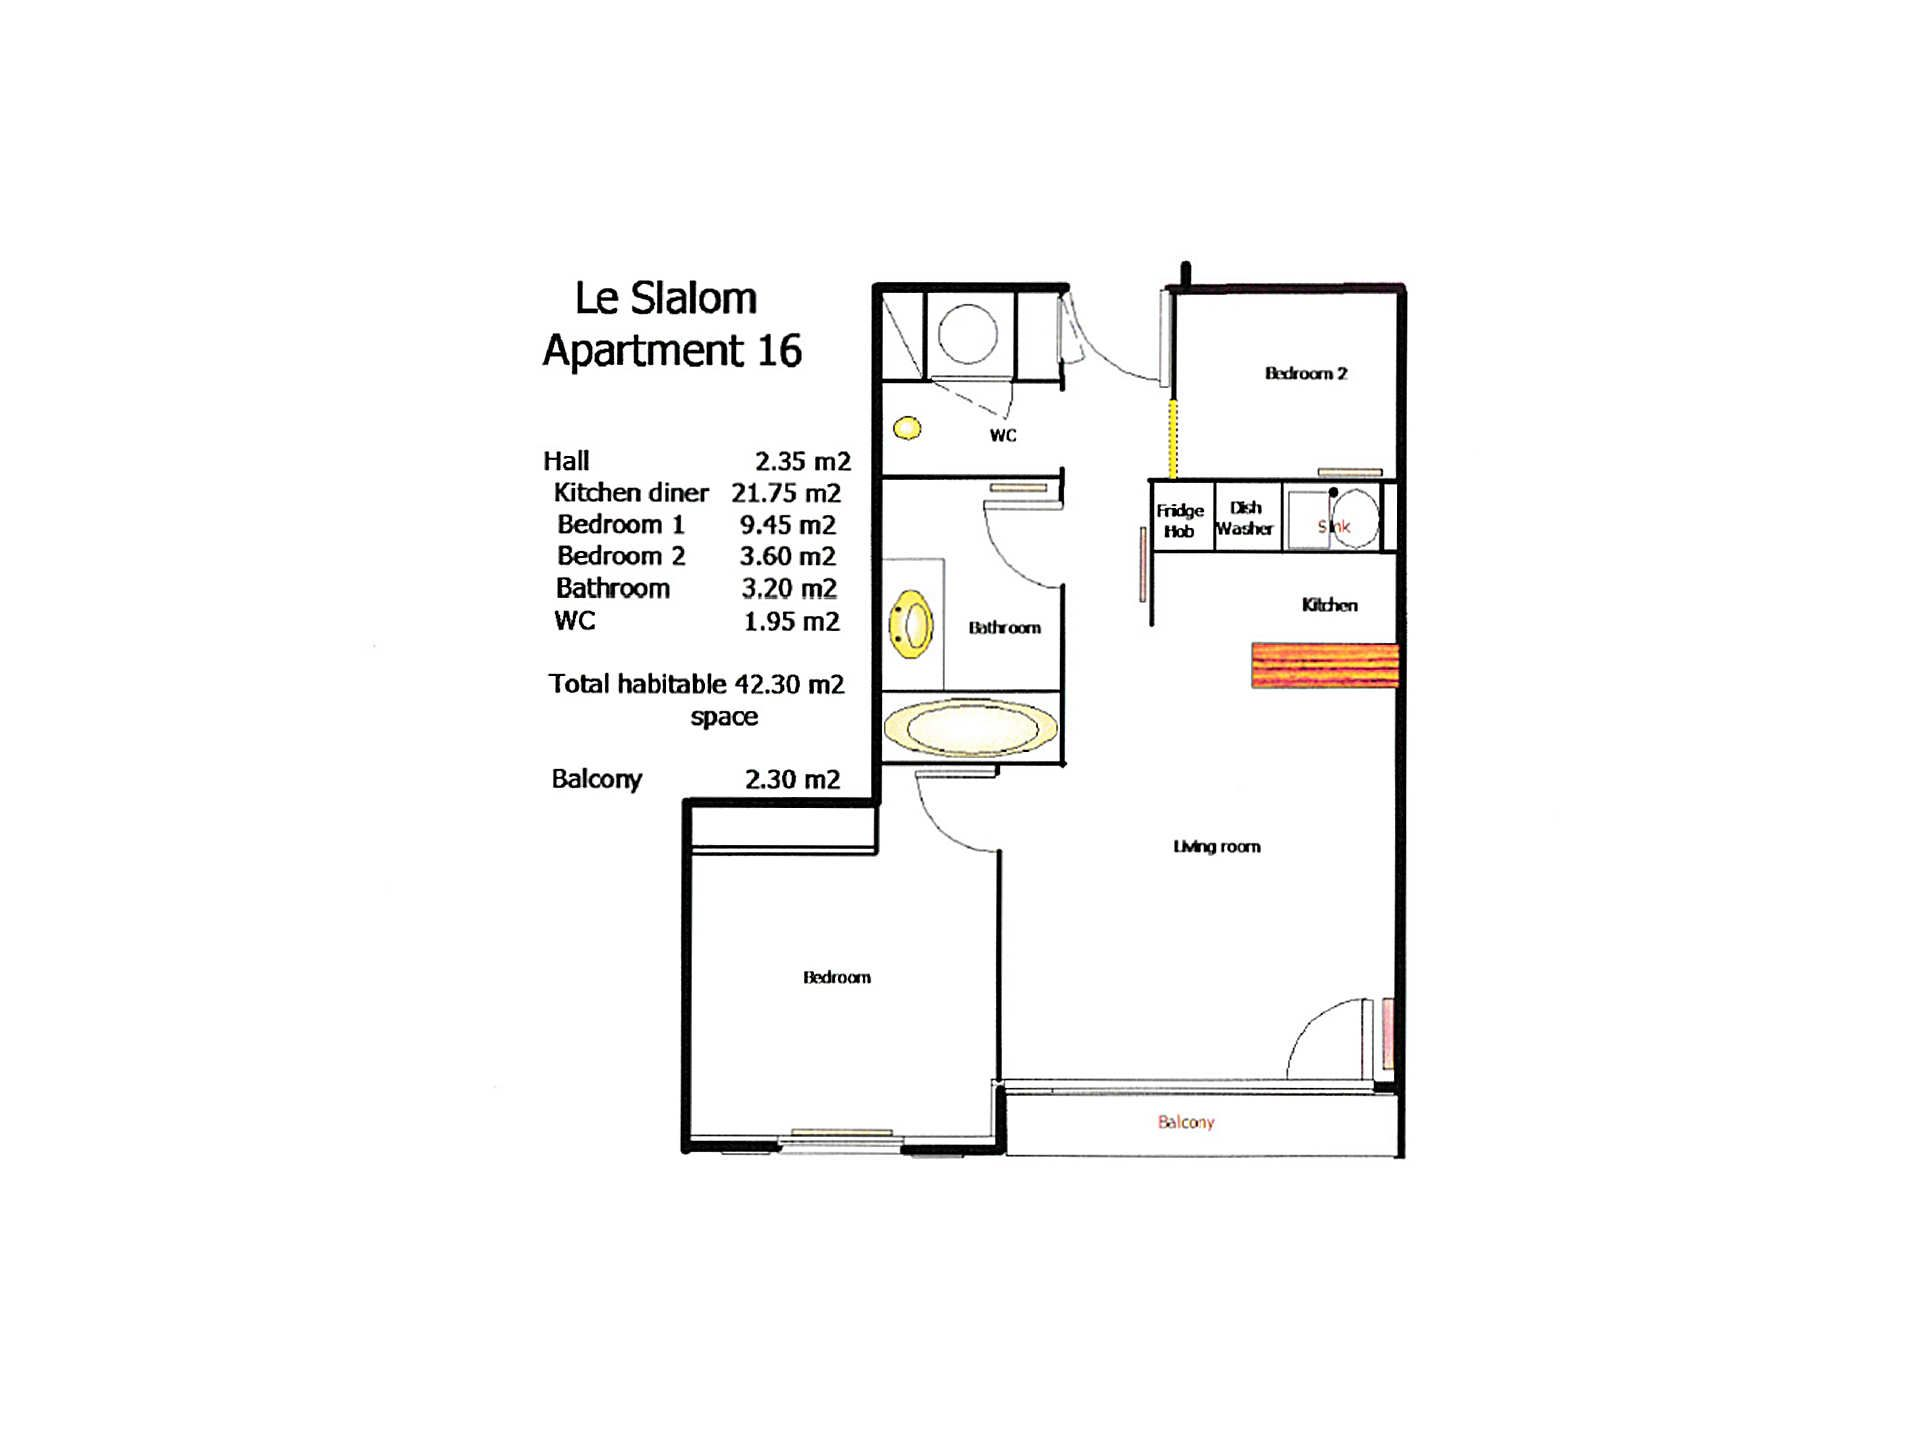 Appt Slalom 16 Alpine Property Estate Agent In The